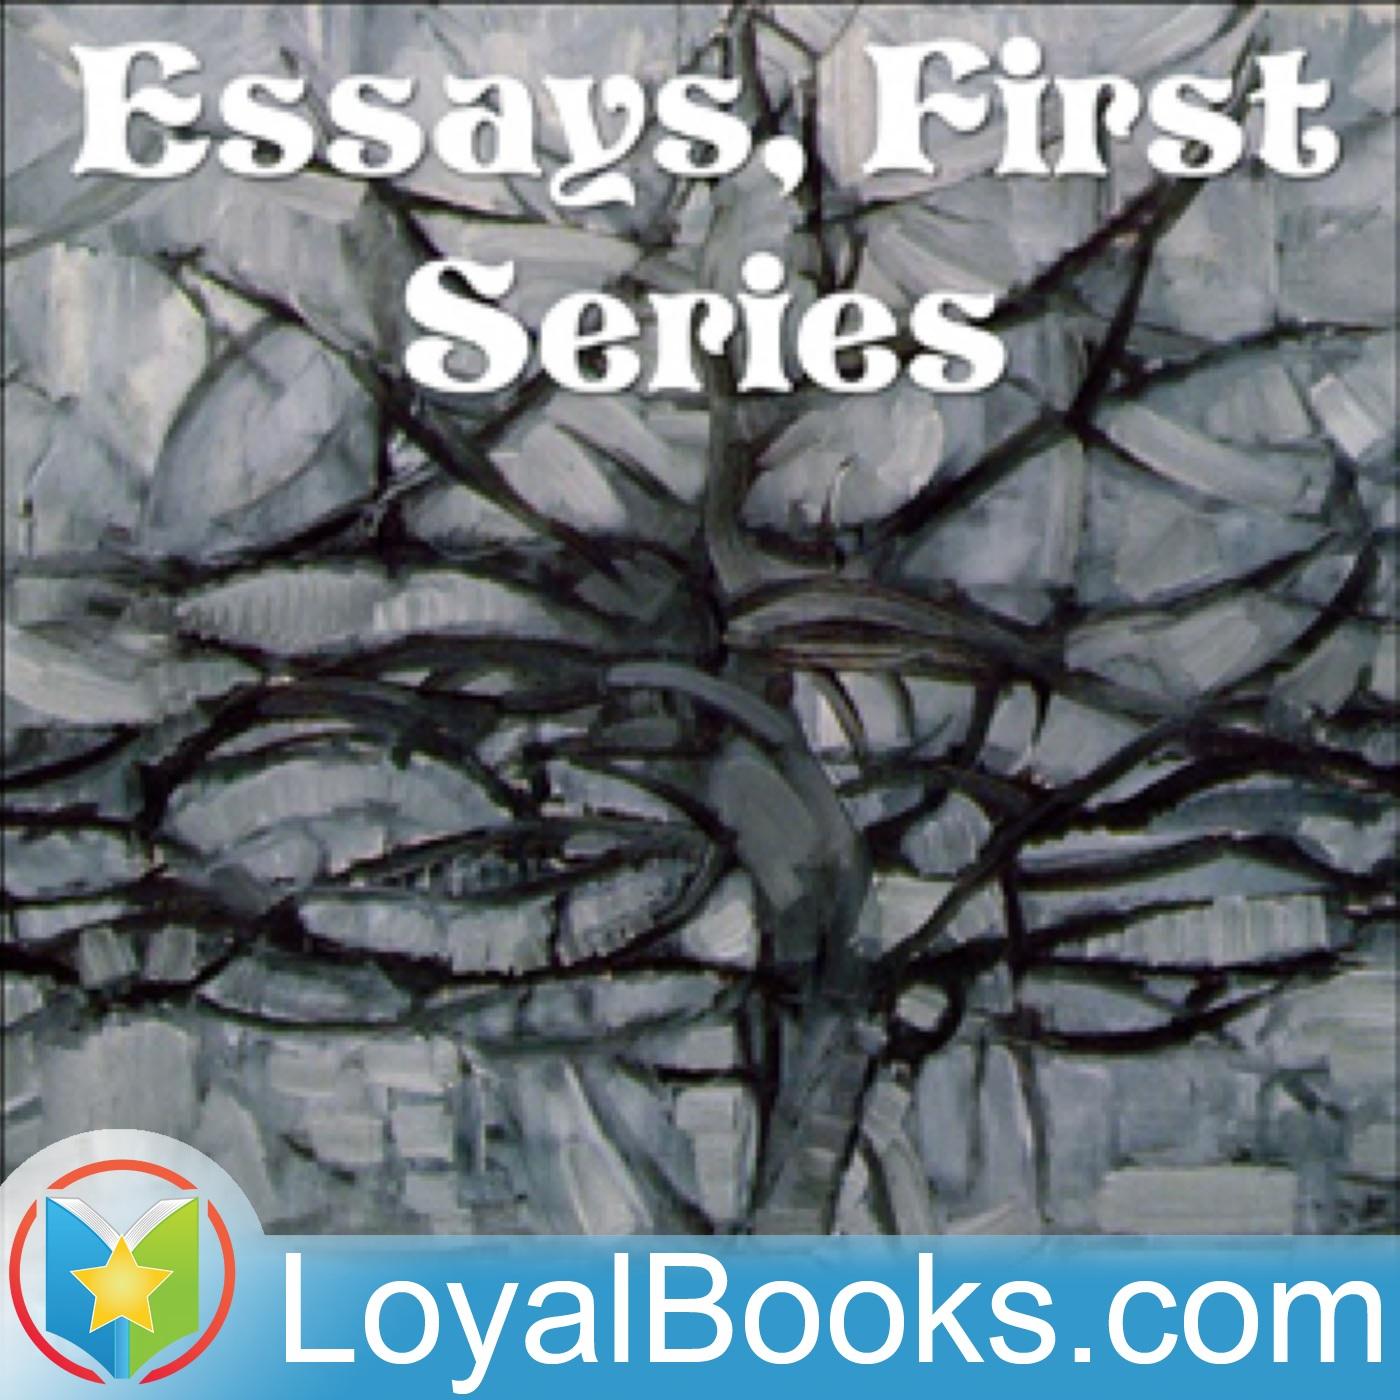 015 Essay Example Essays First Series By Ralph Waldo Stunning Emerson Pdf Shelburne Publisher Full